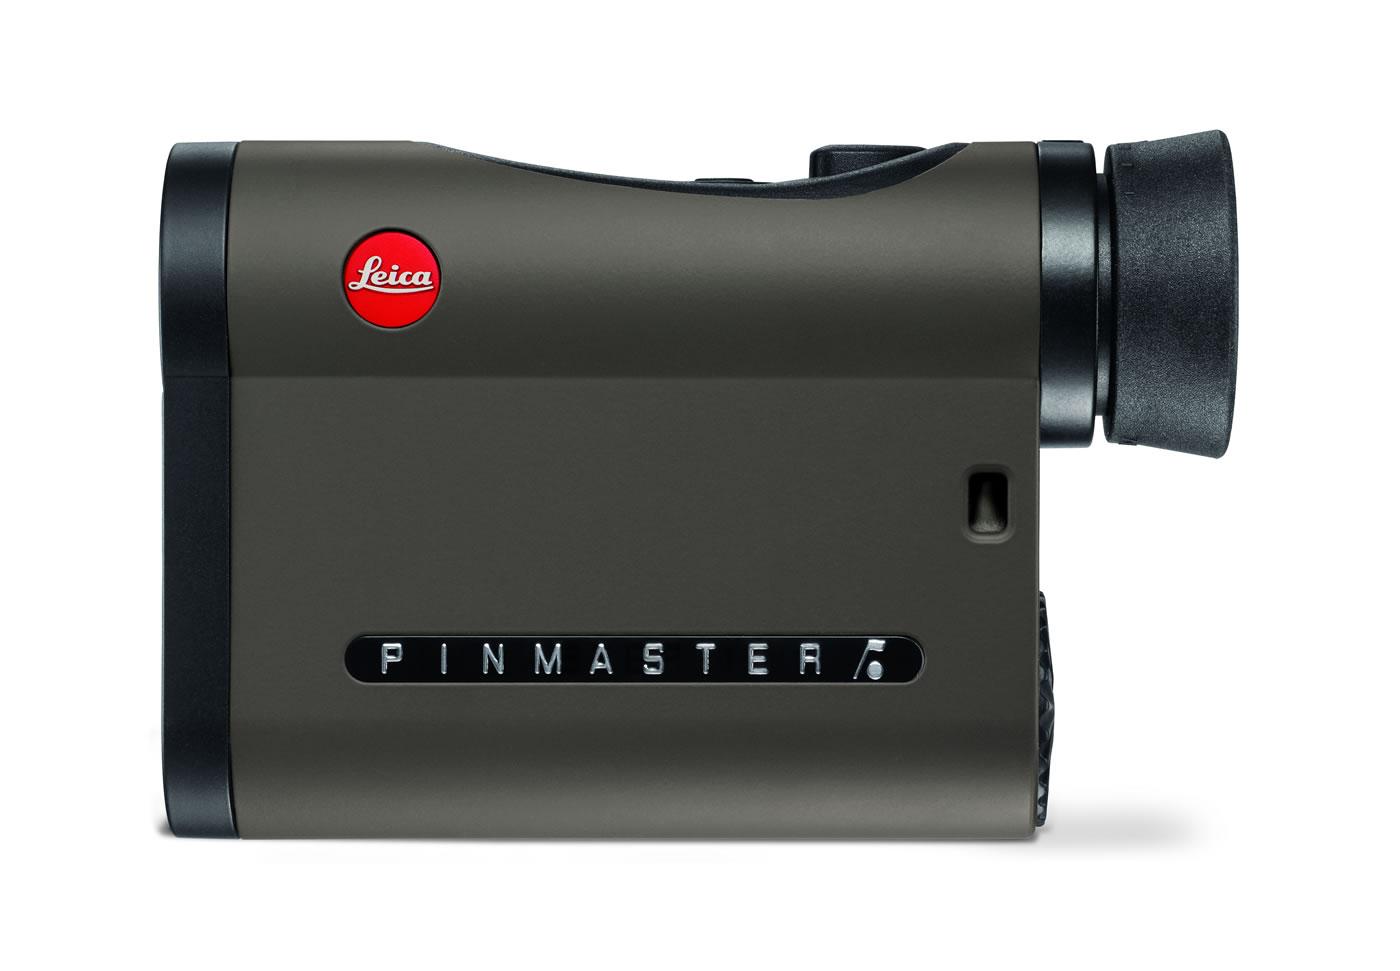 Leica Entfernungsmesser Pinmaster : Leica pinmaster ii golf compact laser rangefinder ebay